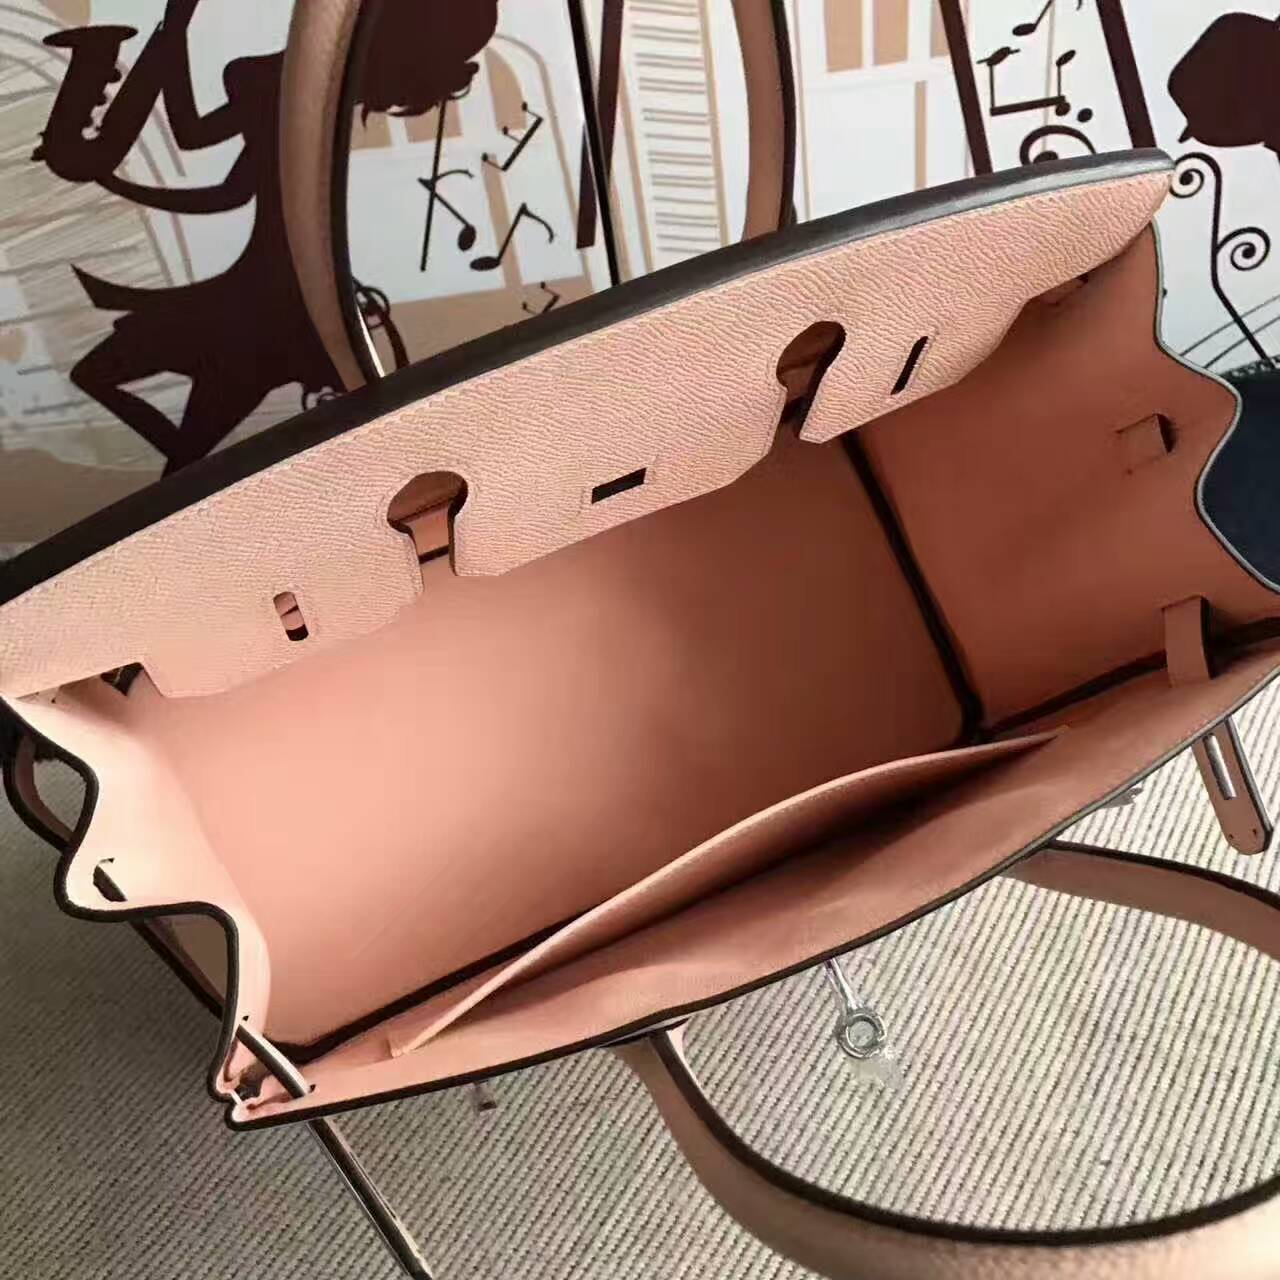 New Arrival Hermes Birkin30cm Bag in P1 Rose Elglantine Epsom Calfskin Leather